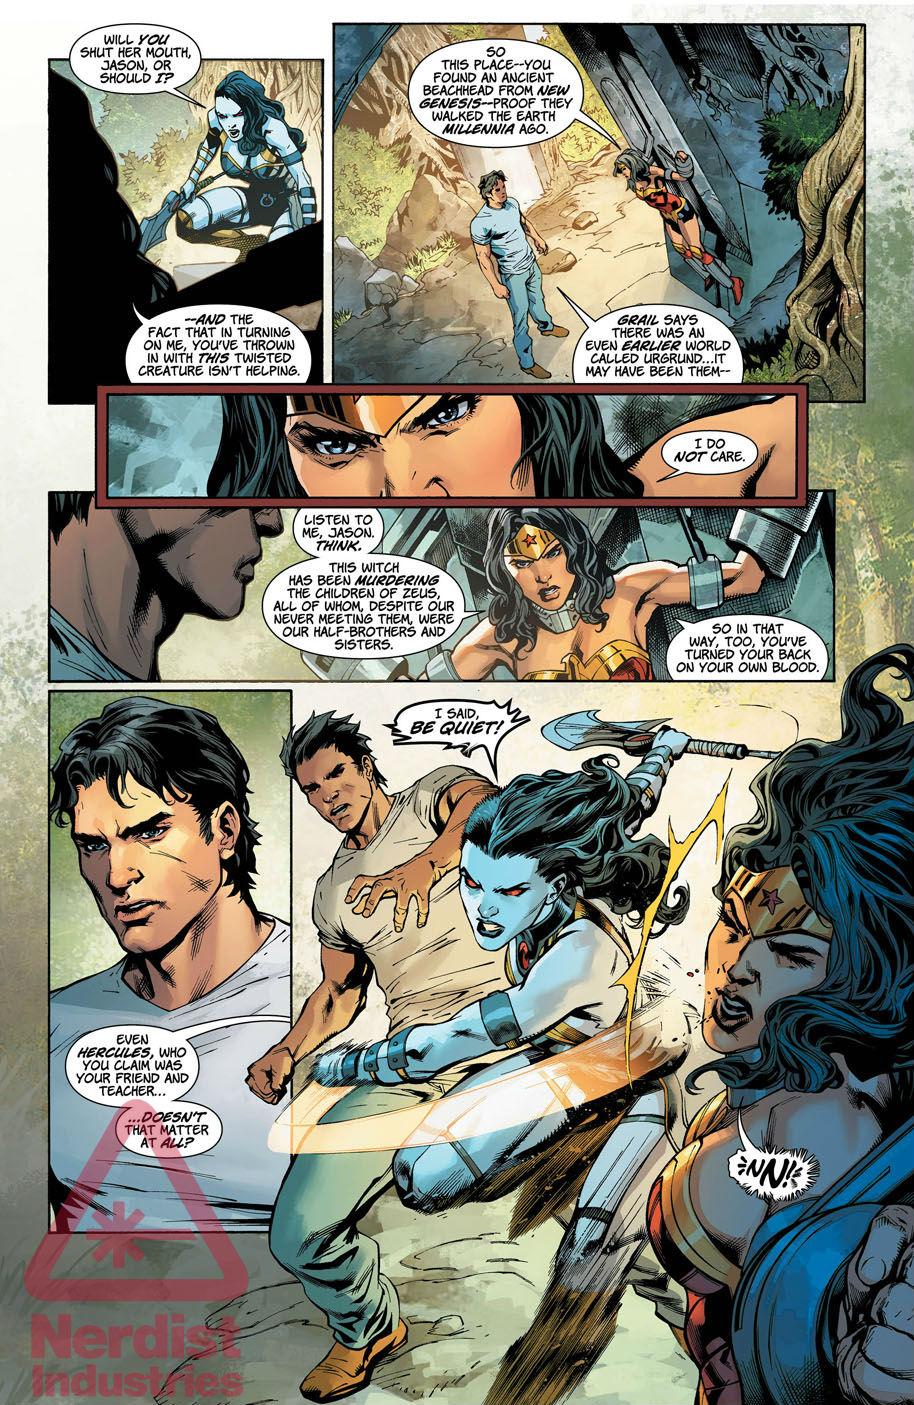 Wonder-Woman-36-page-3